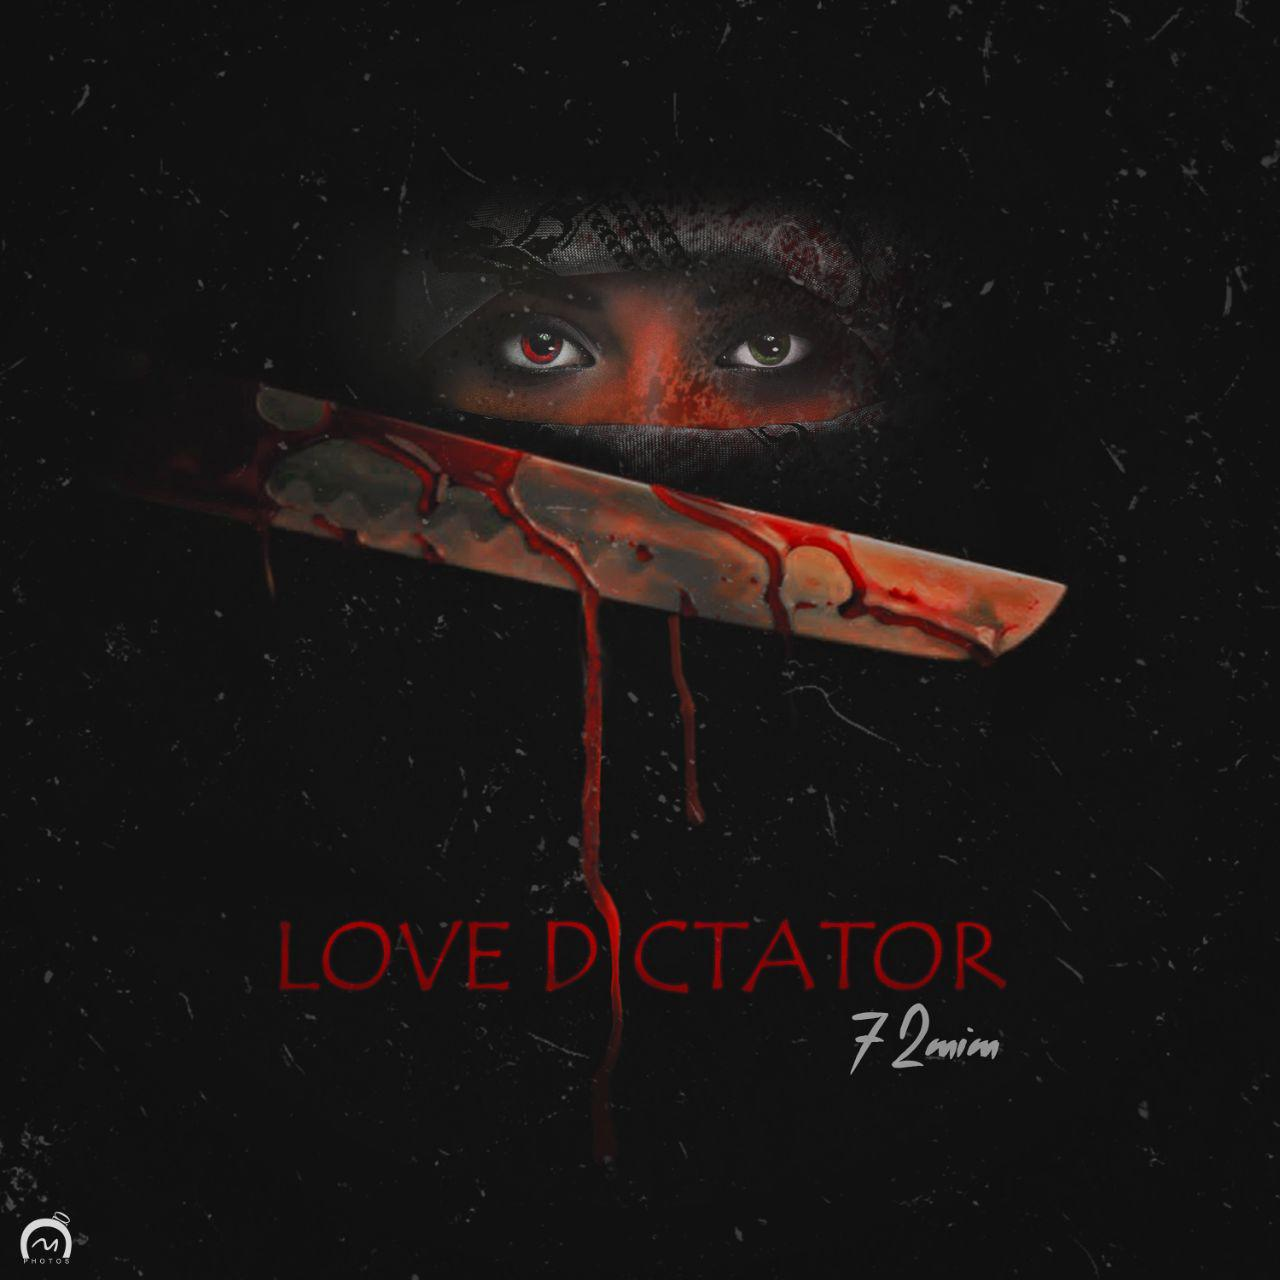 72Mim - Love Dictator Music | آهنگ 72Mim - Love Dictator